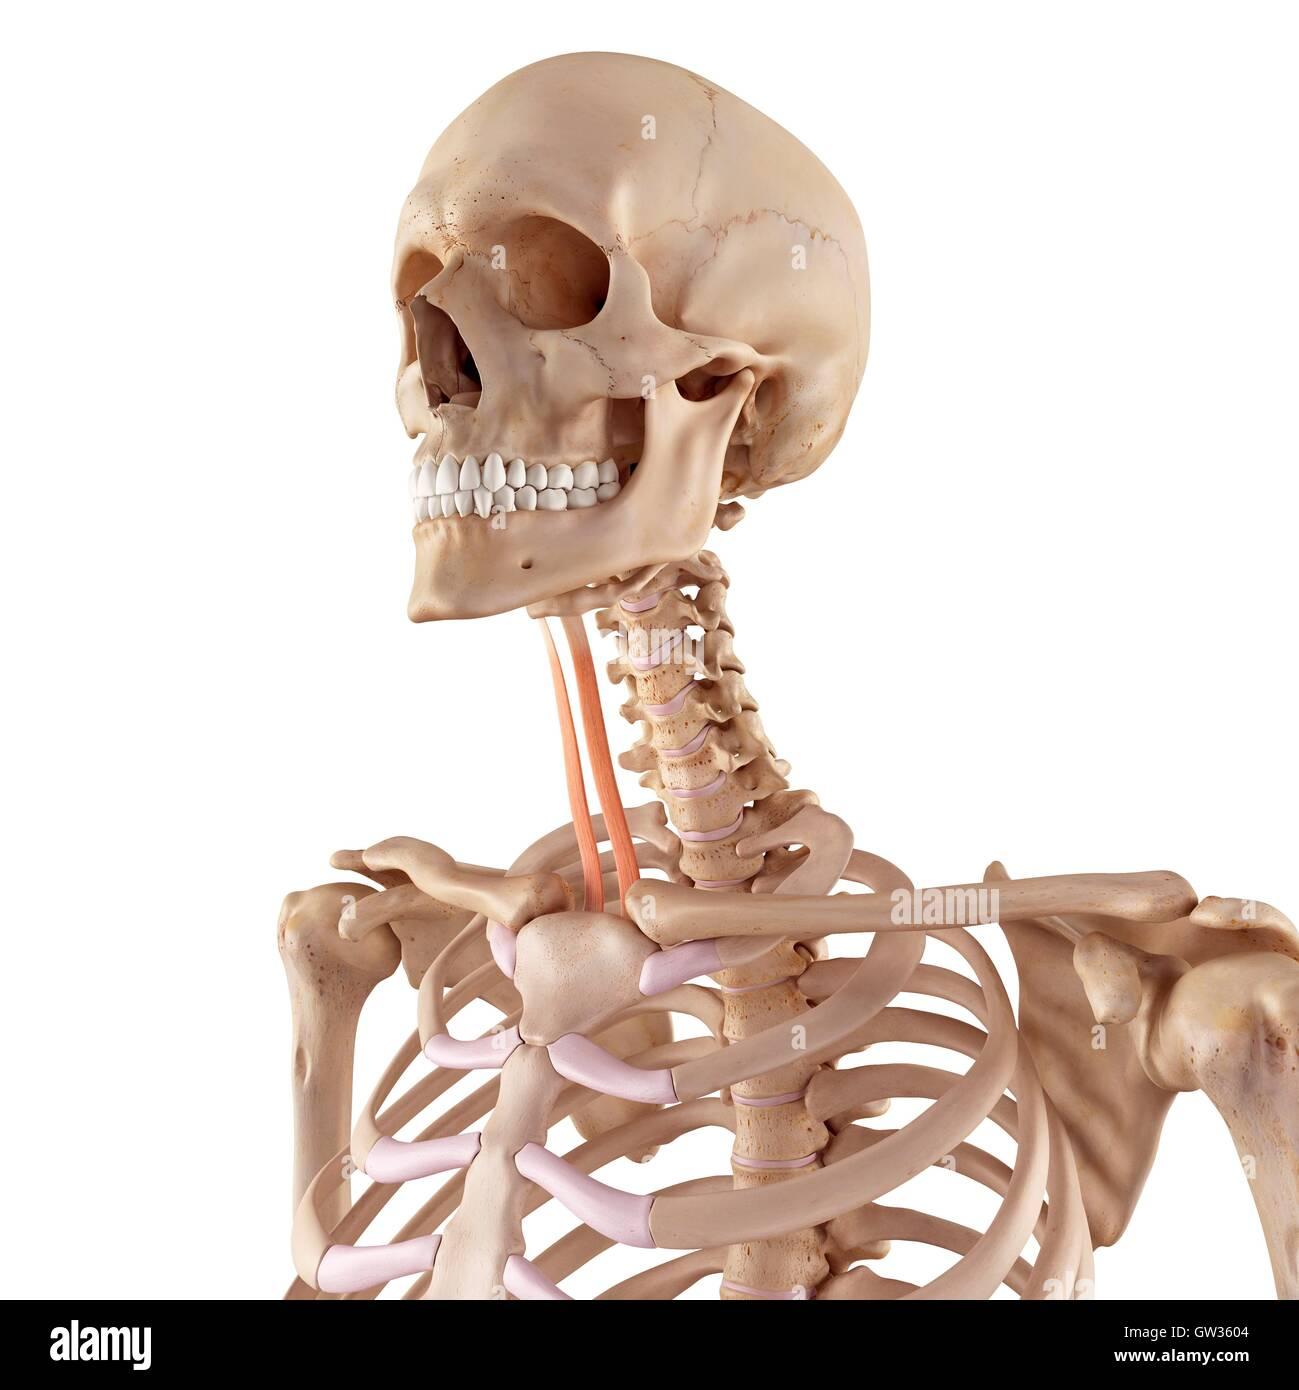 Hals-Muskeln, Abbildung Stockfoto, Bild: 118699172 - Alamy